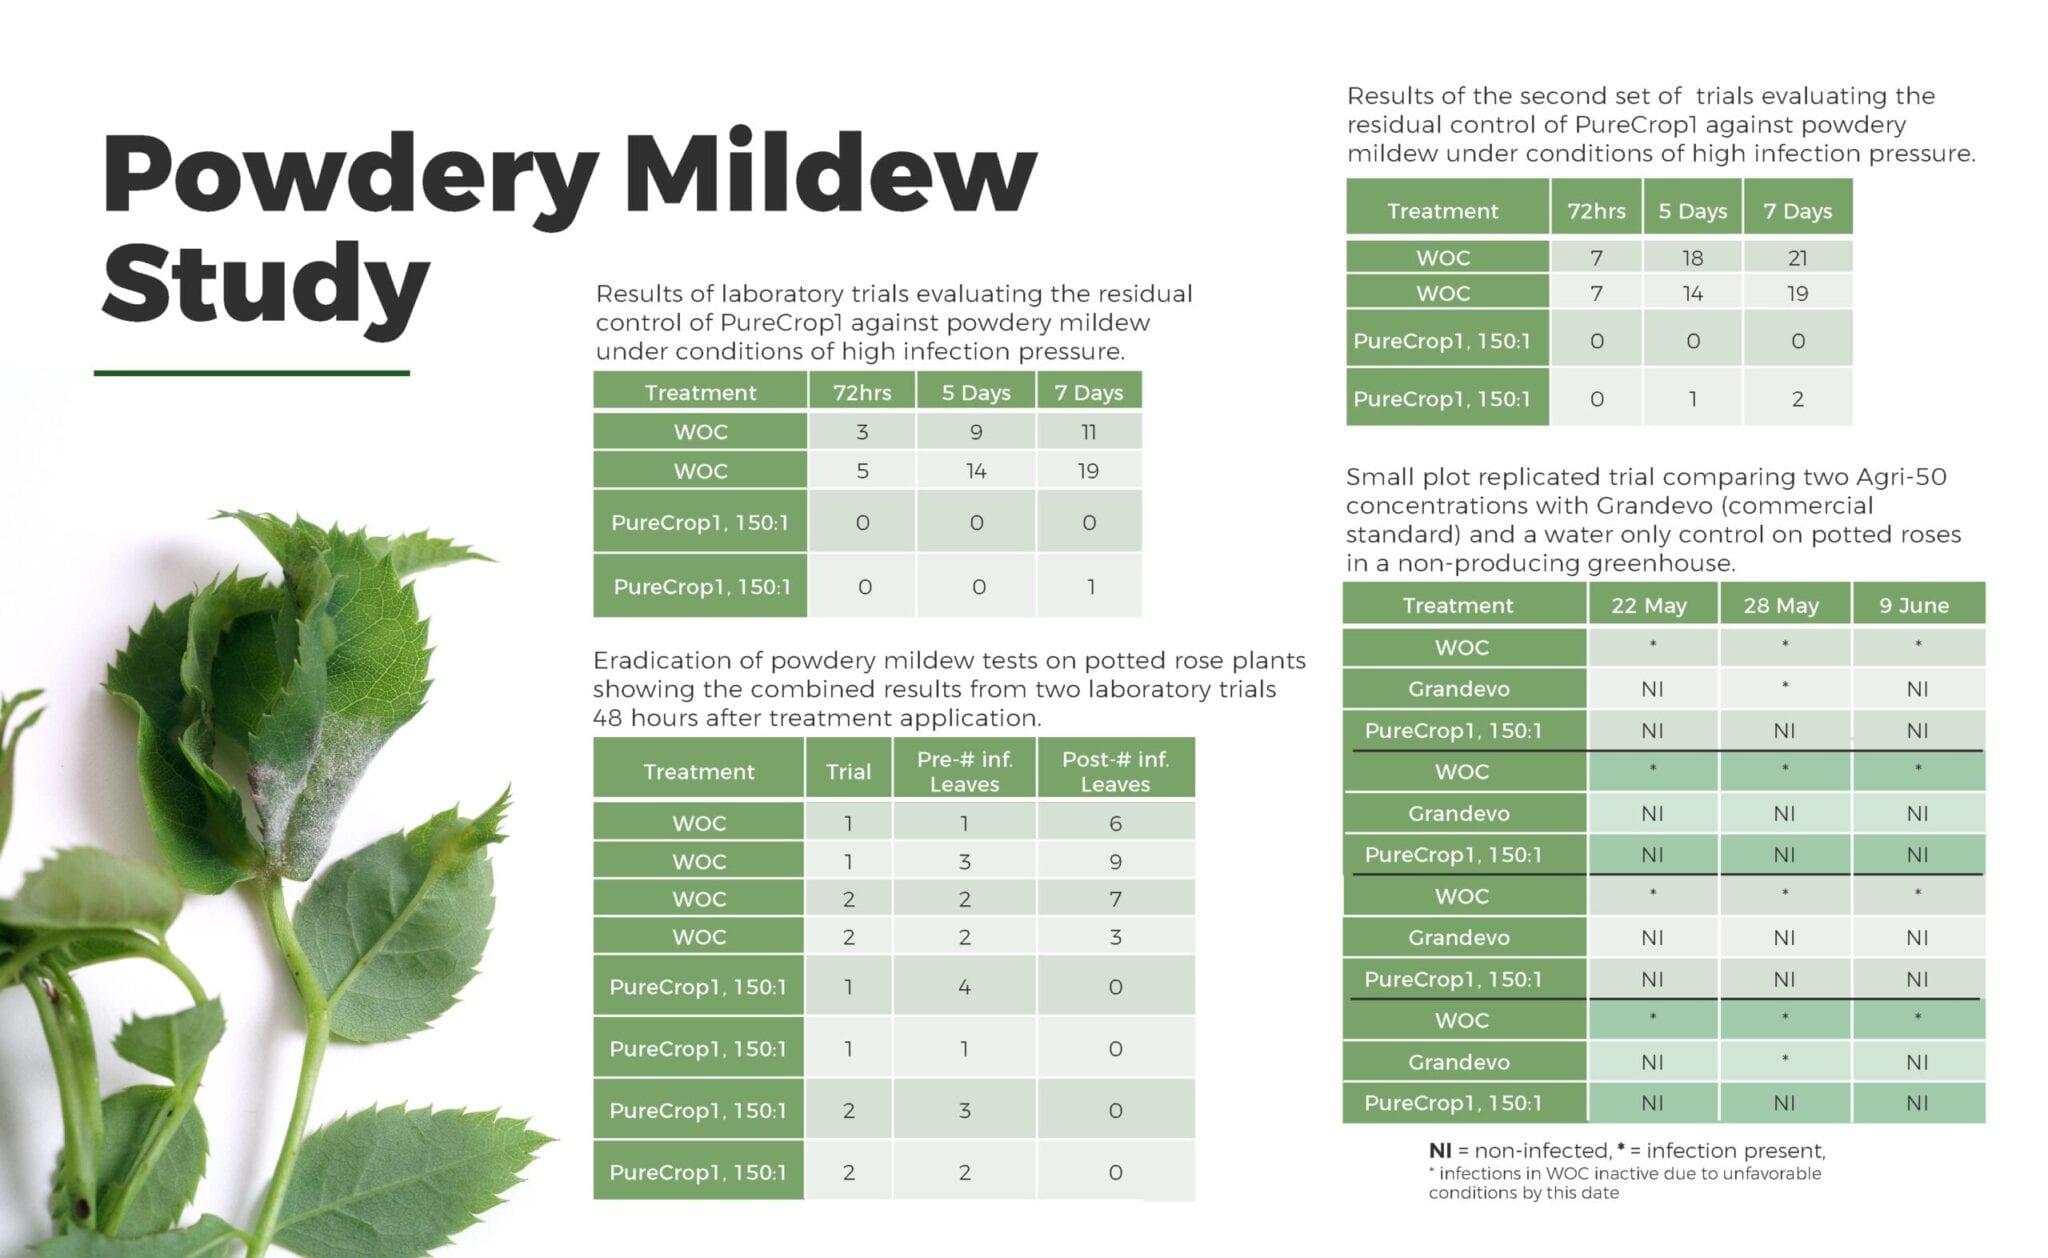 Powdery Mildew Studies